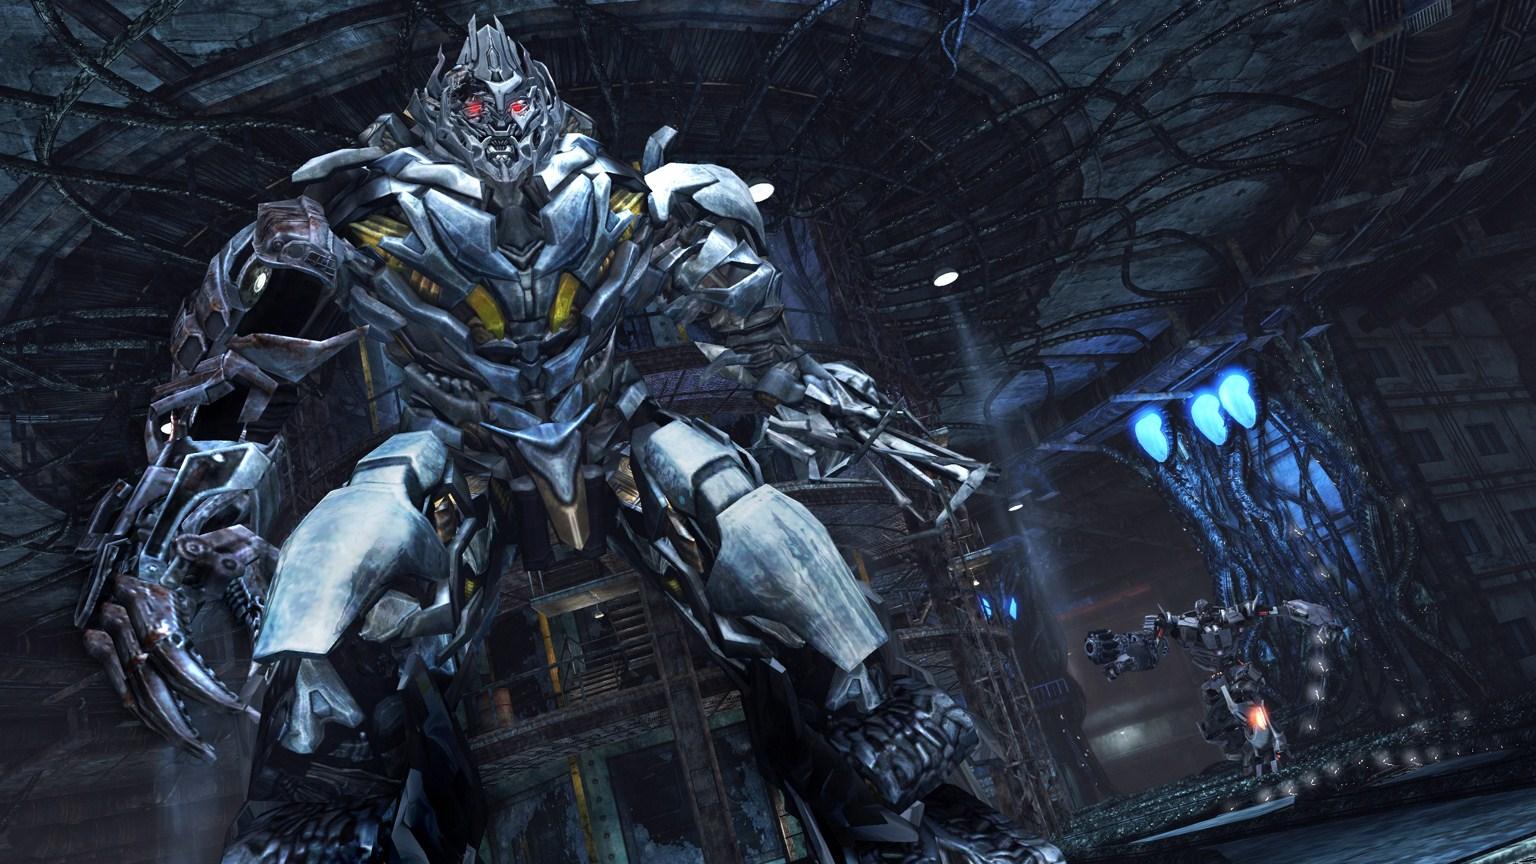 Transformers: Dark of the Moon - Prime immagini